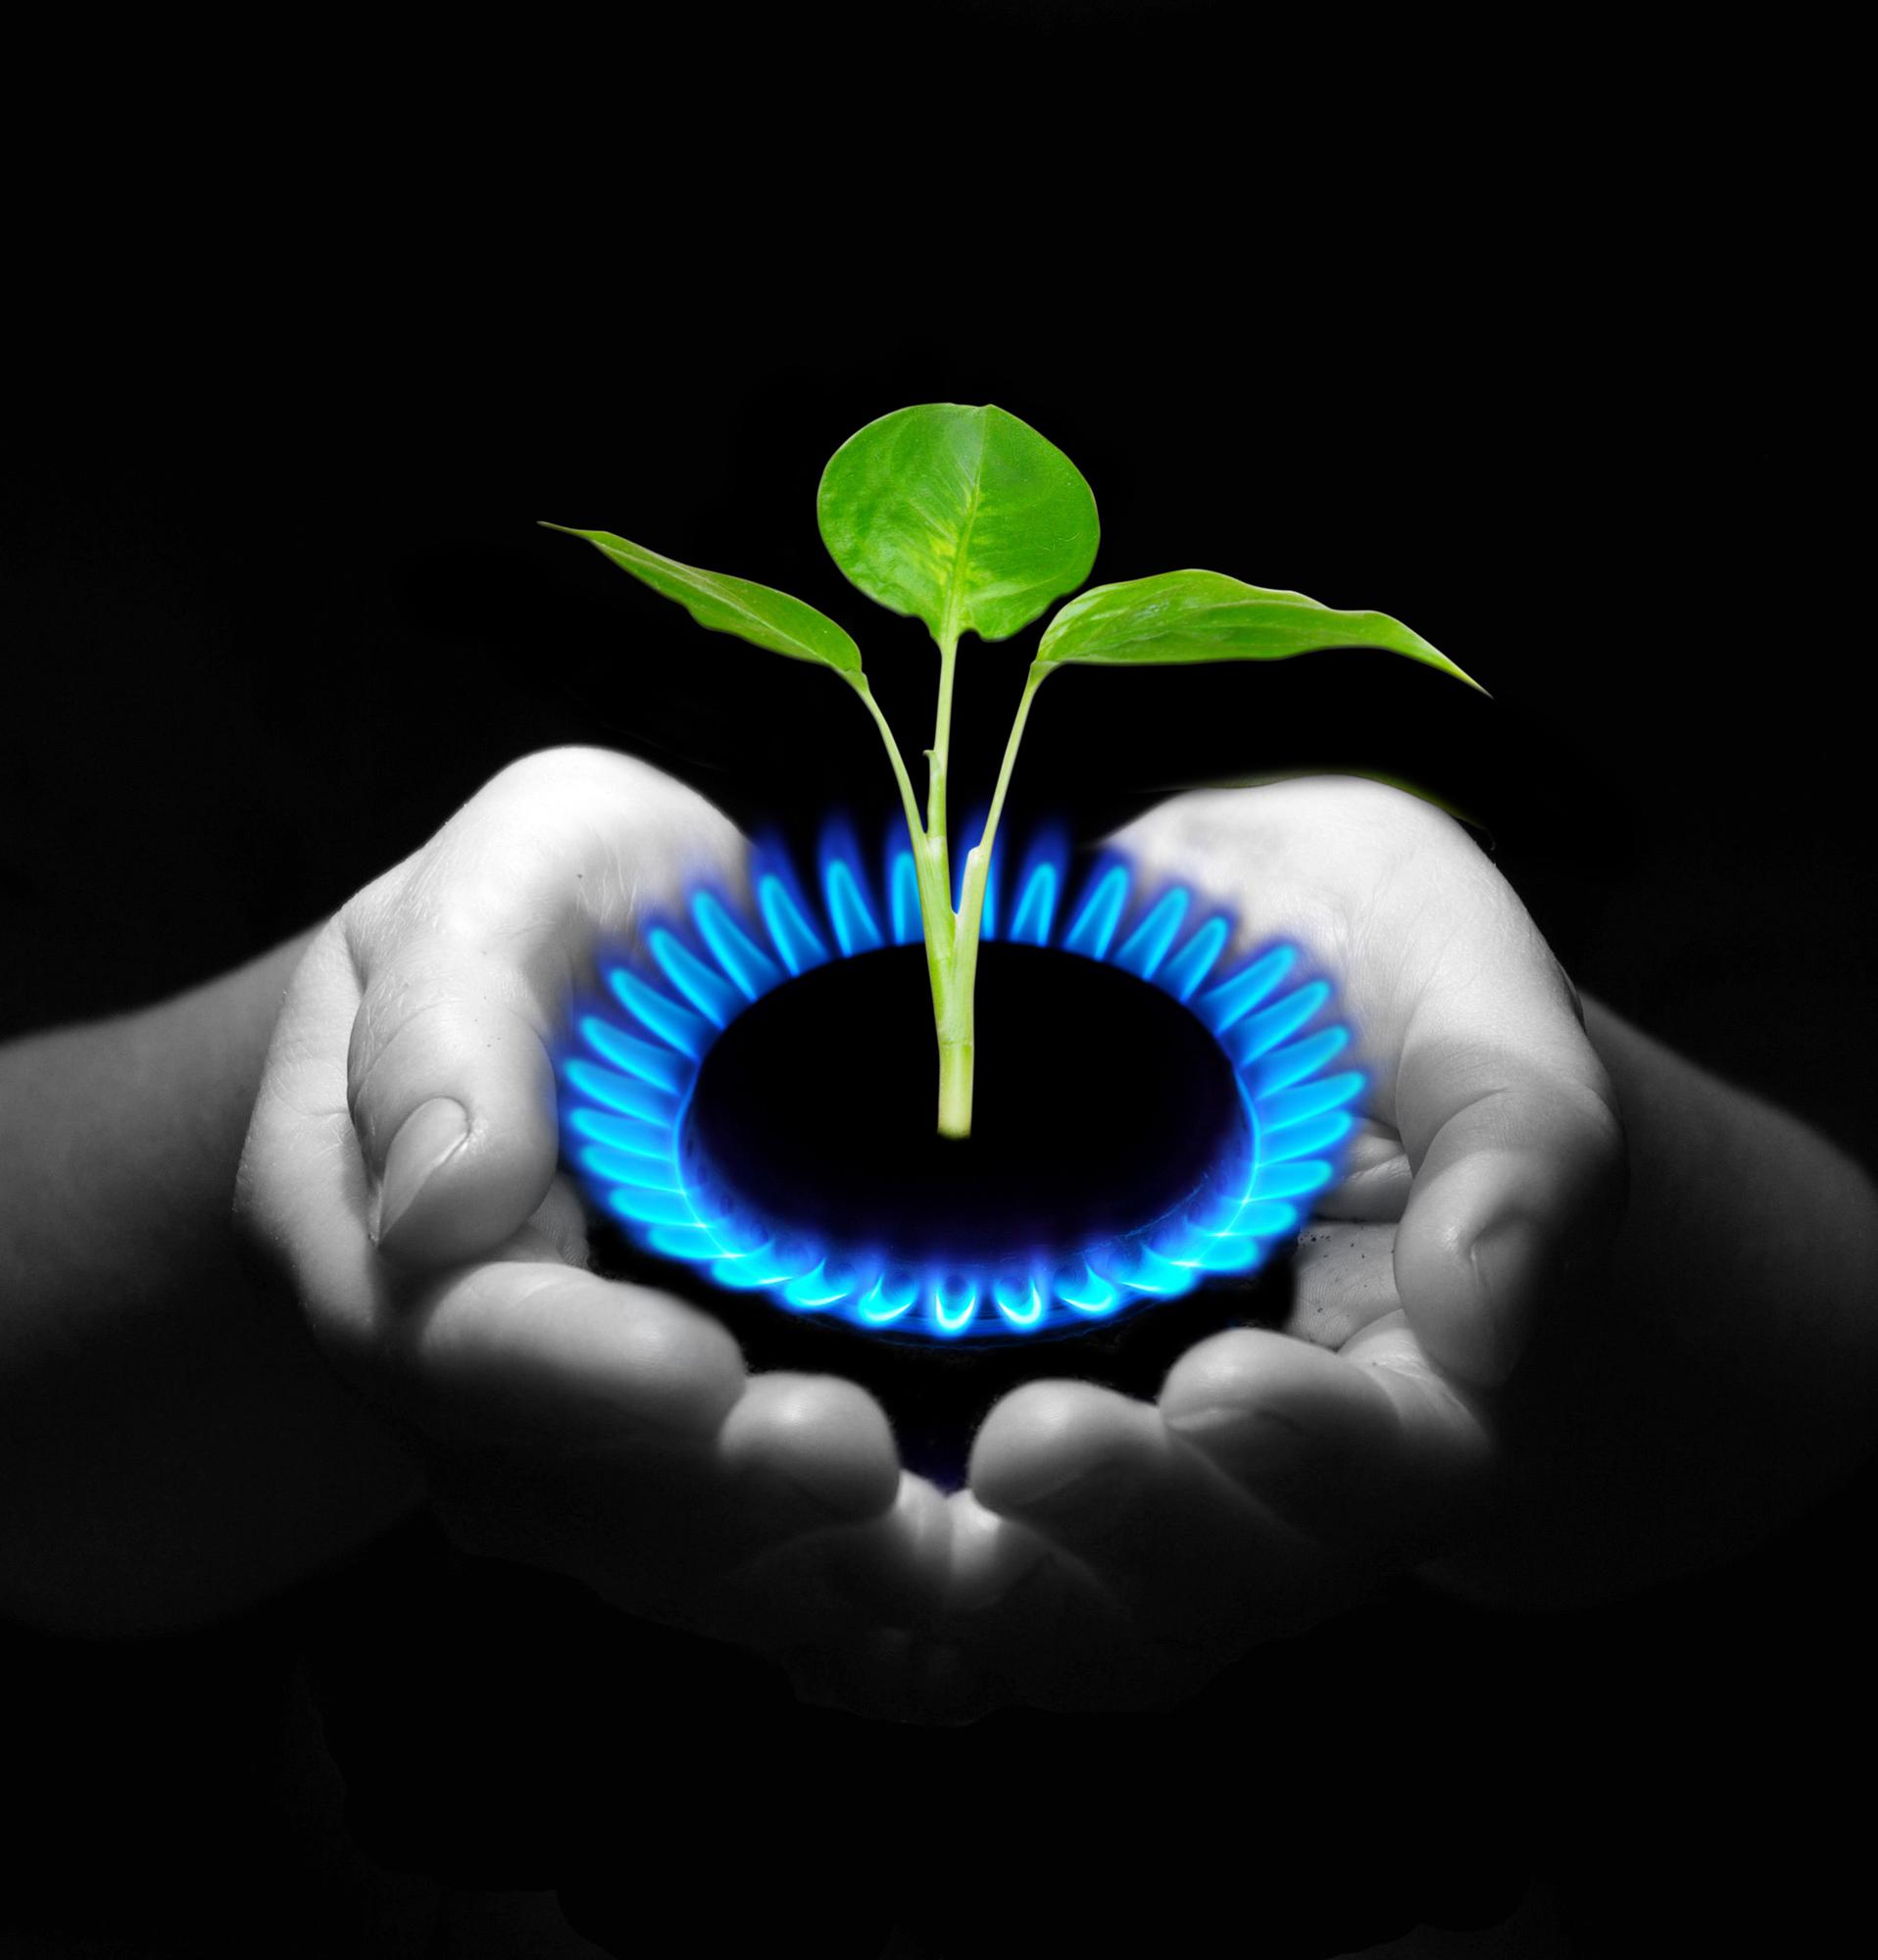 Clean burning propane gas